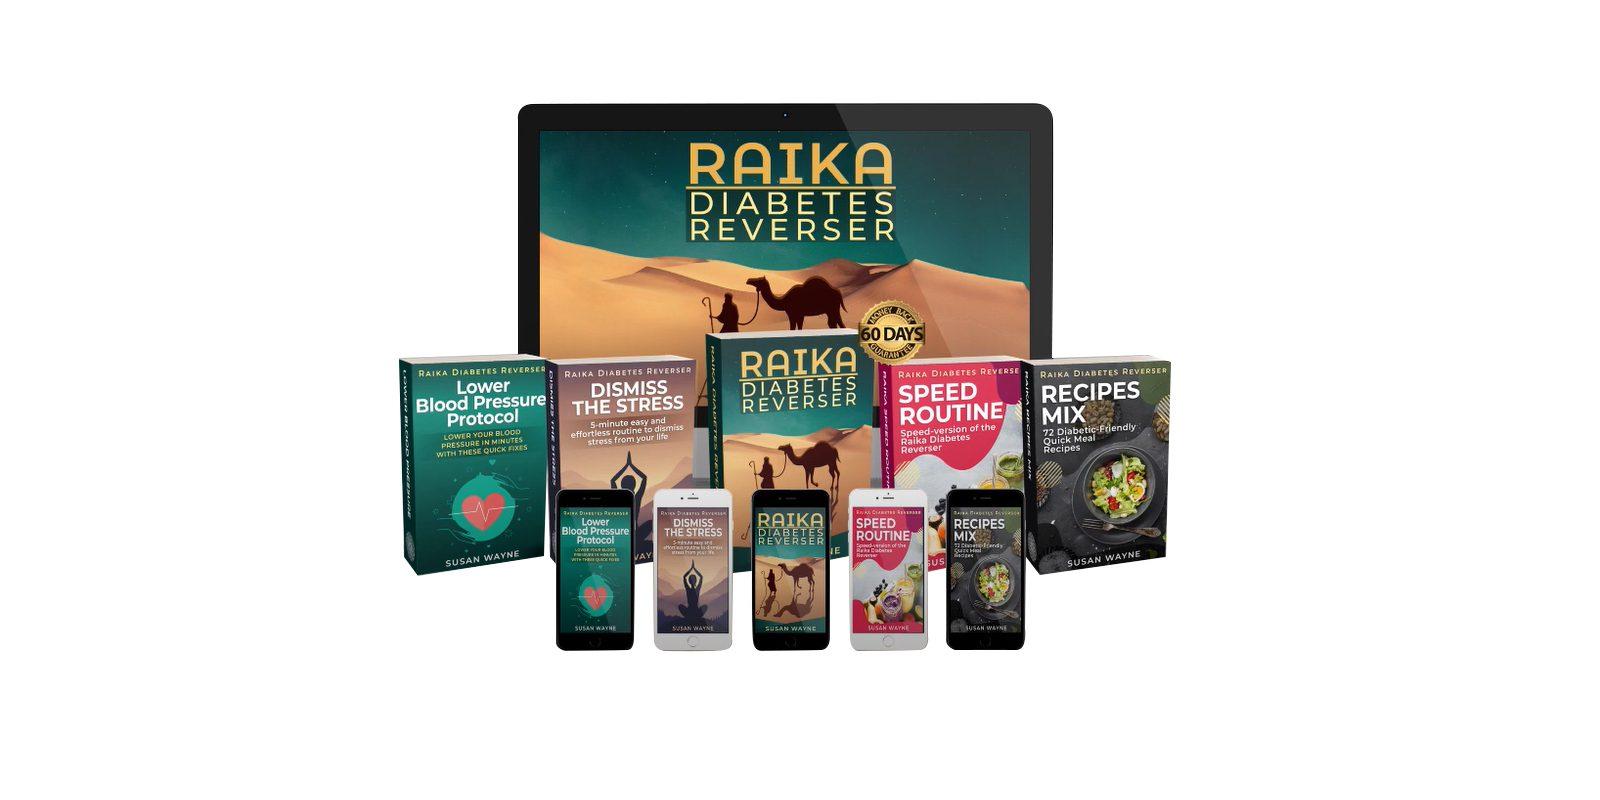 Raika Diabetes Reverser program